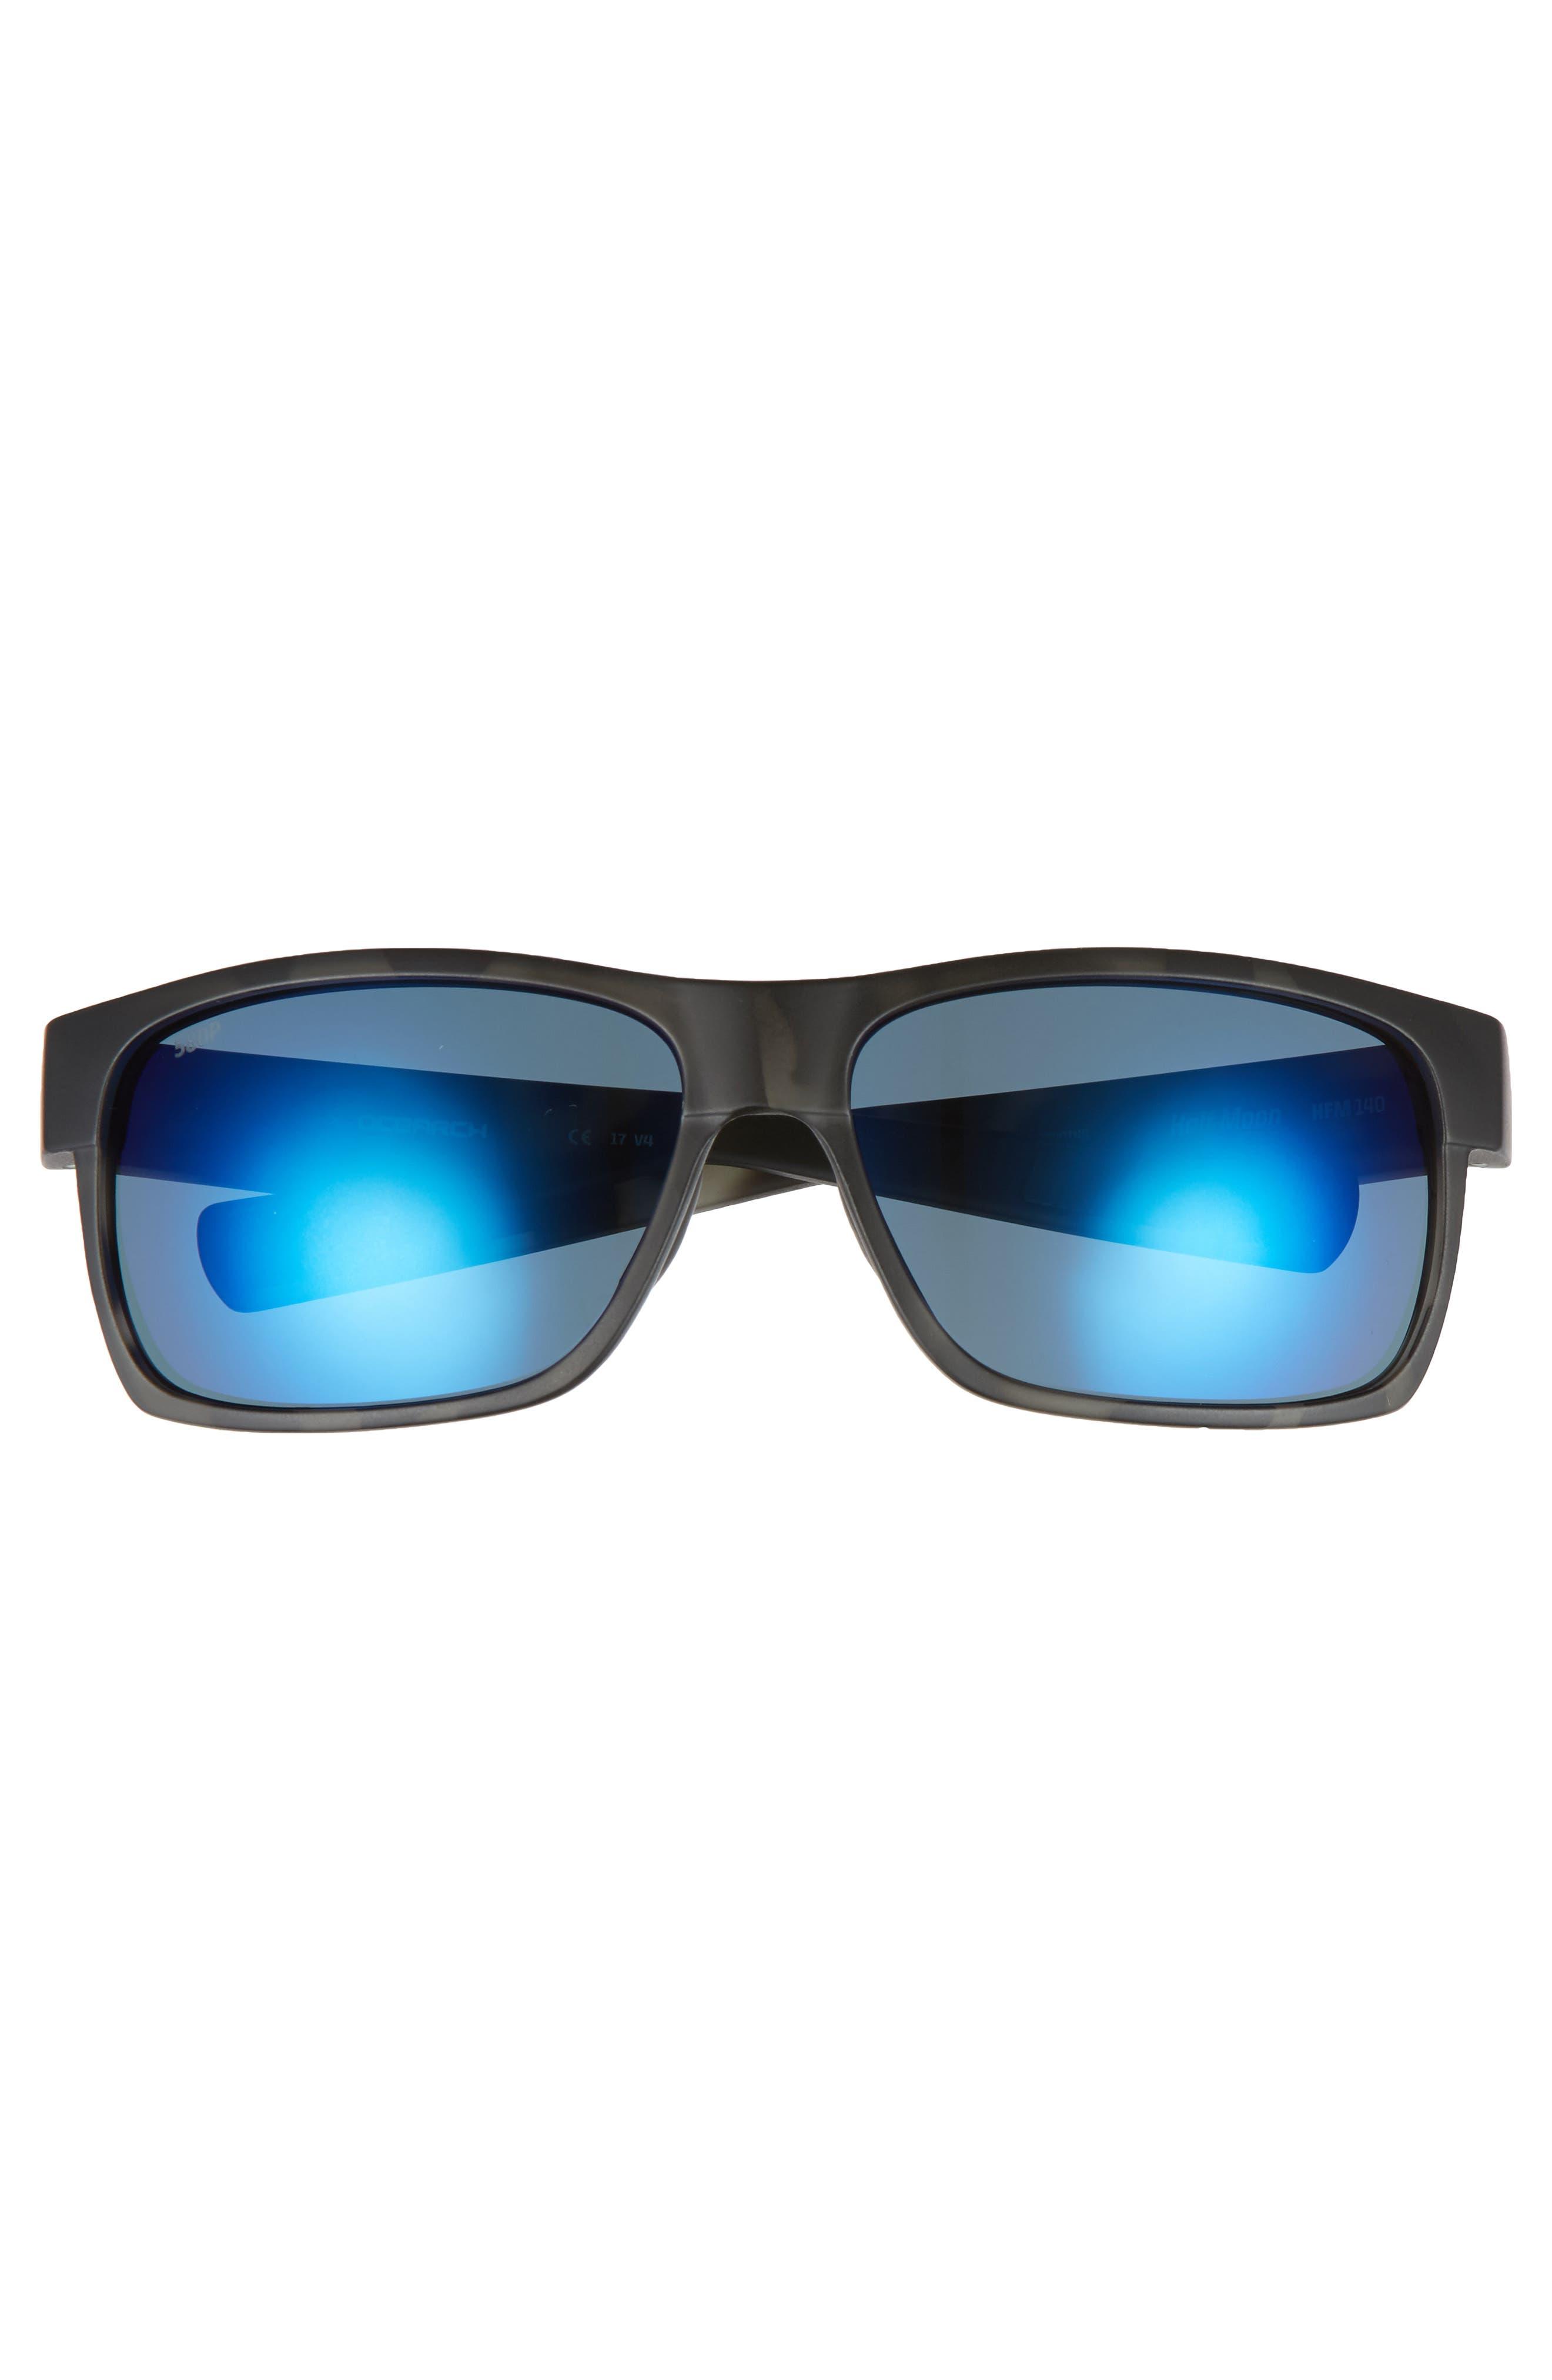 Half Moon 60mm Polarized Sunglasses,                             Alternate thumbnail 2, color,                             BLACK TORTOISE/ SILVER MIRROR